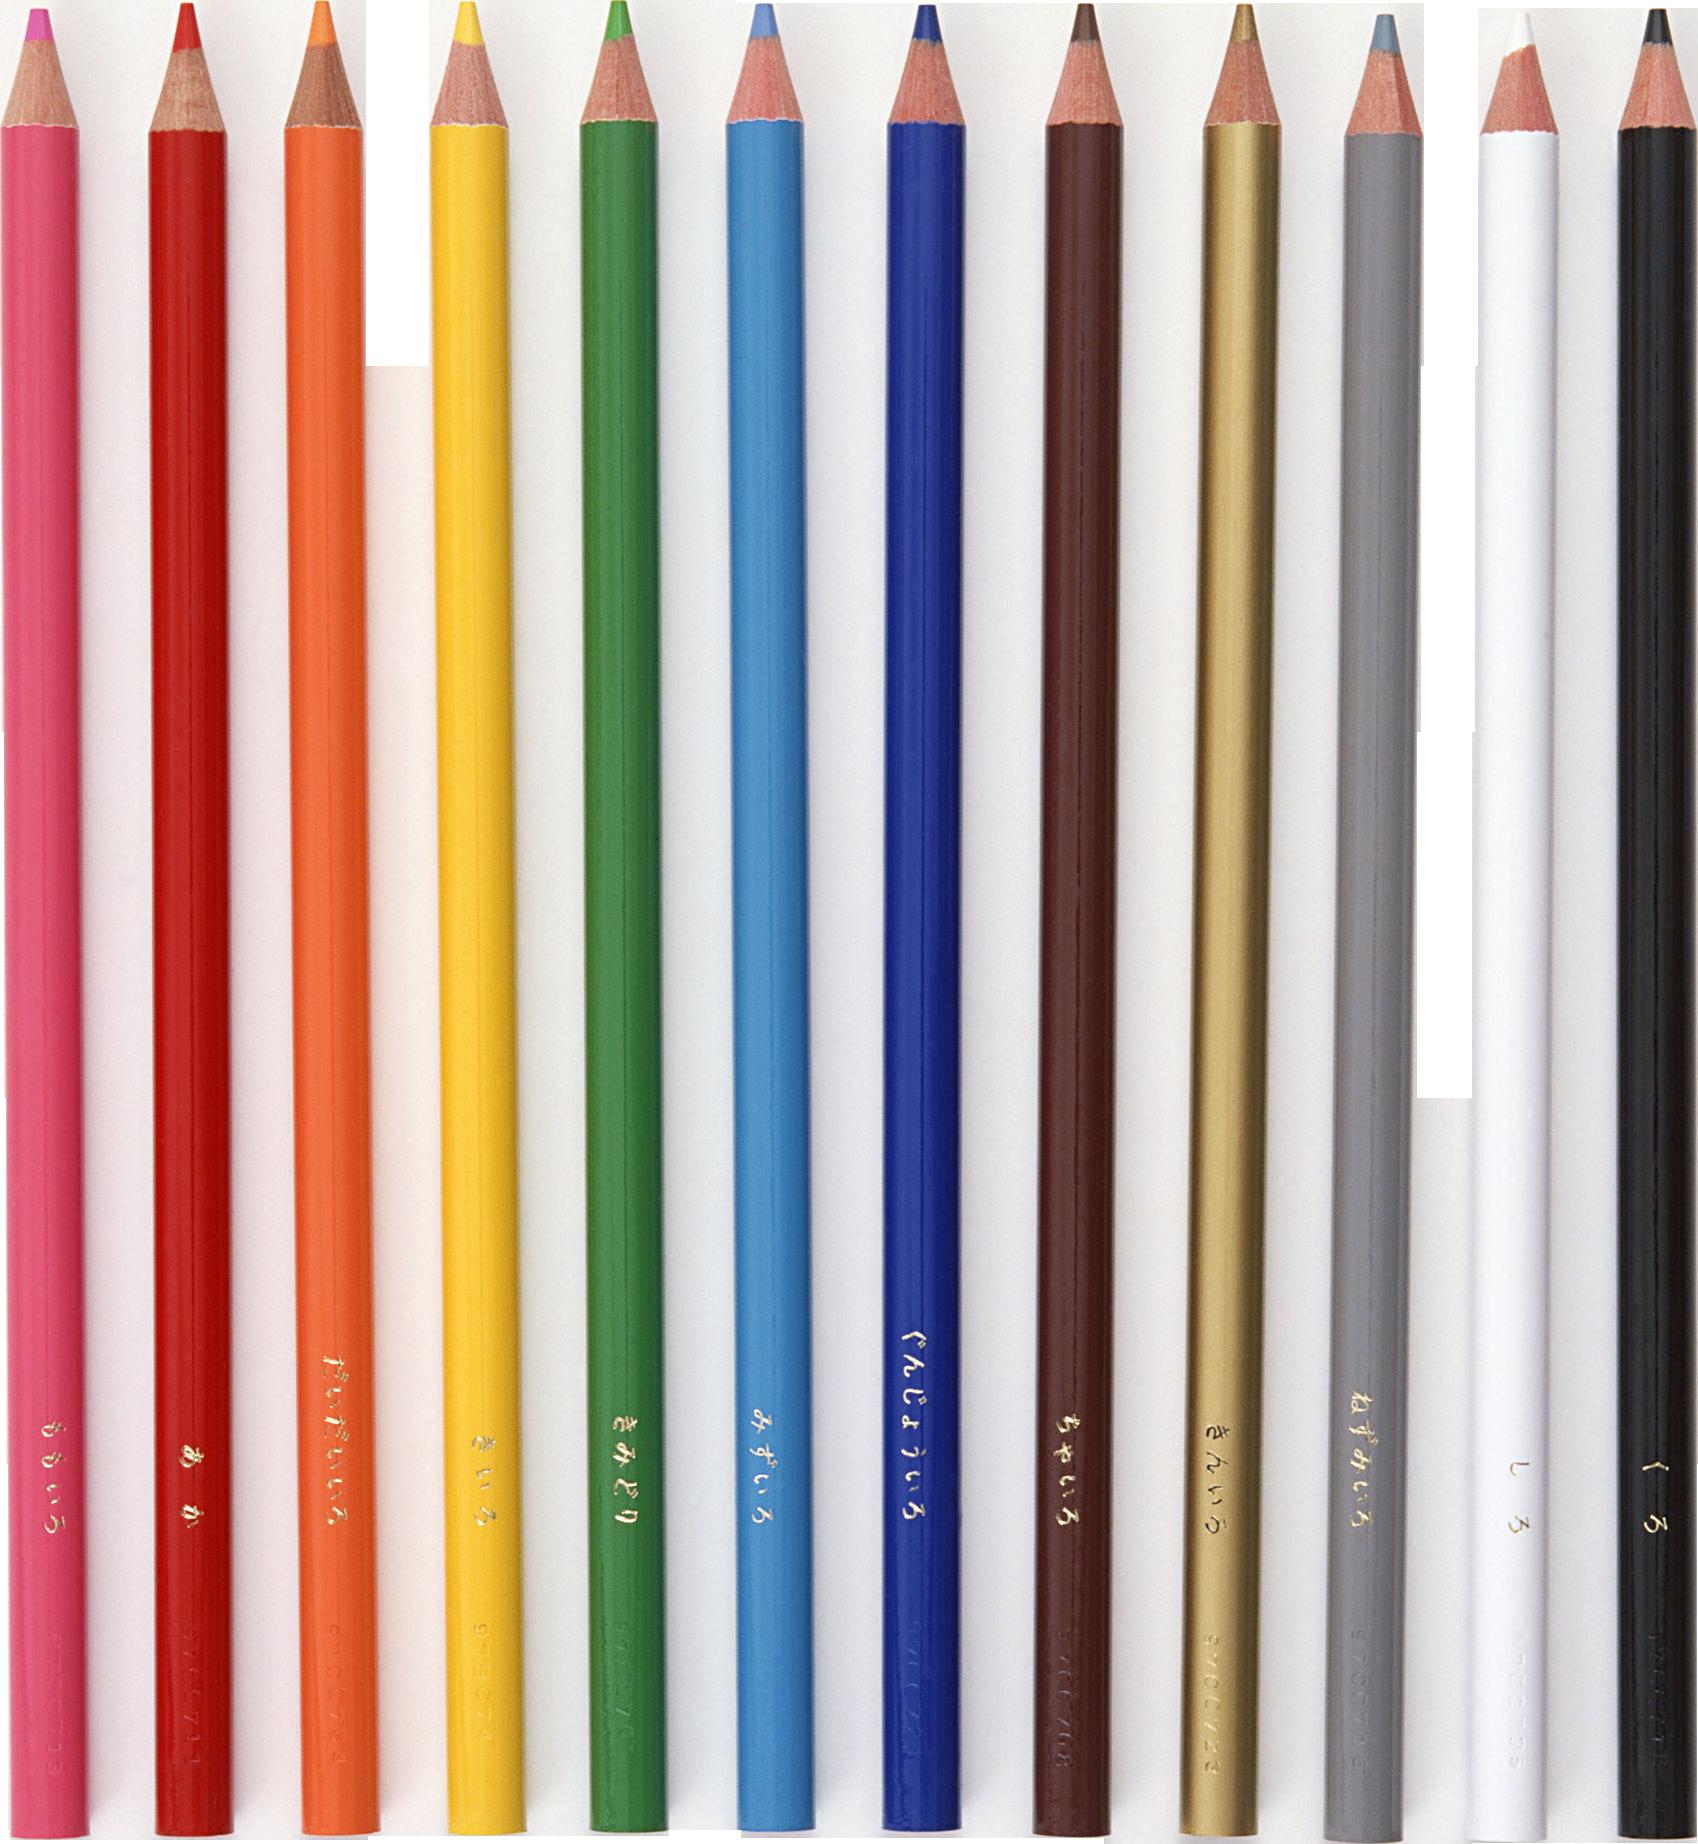 Color Pen Png (1698x1844), Png Download